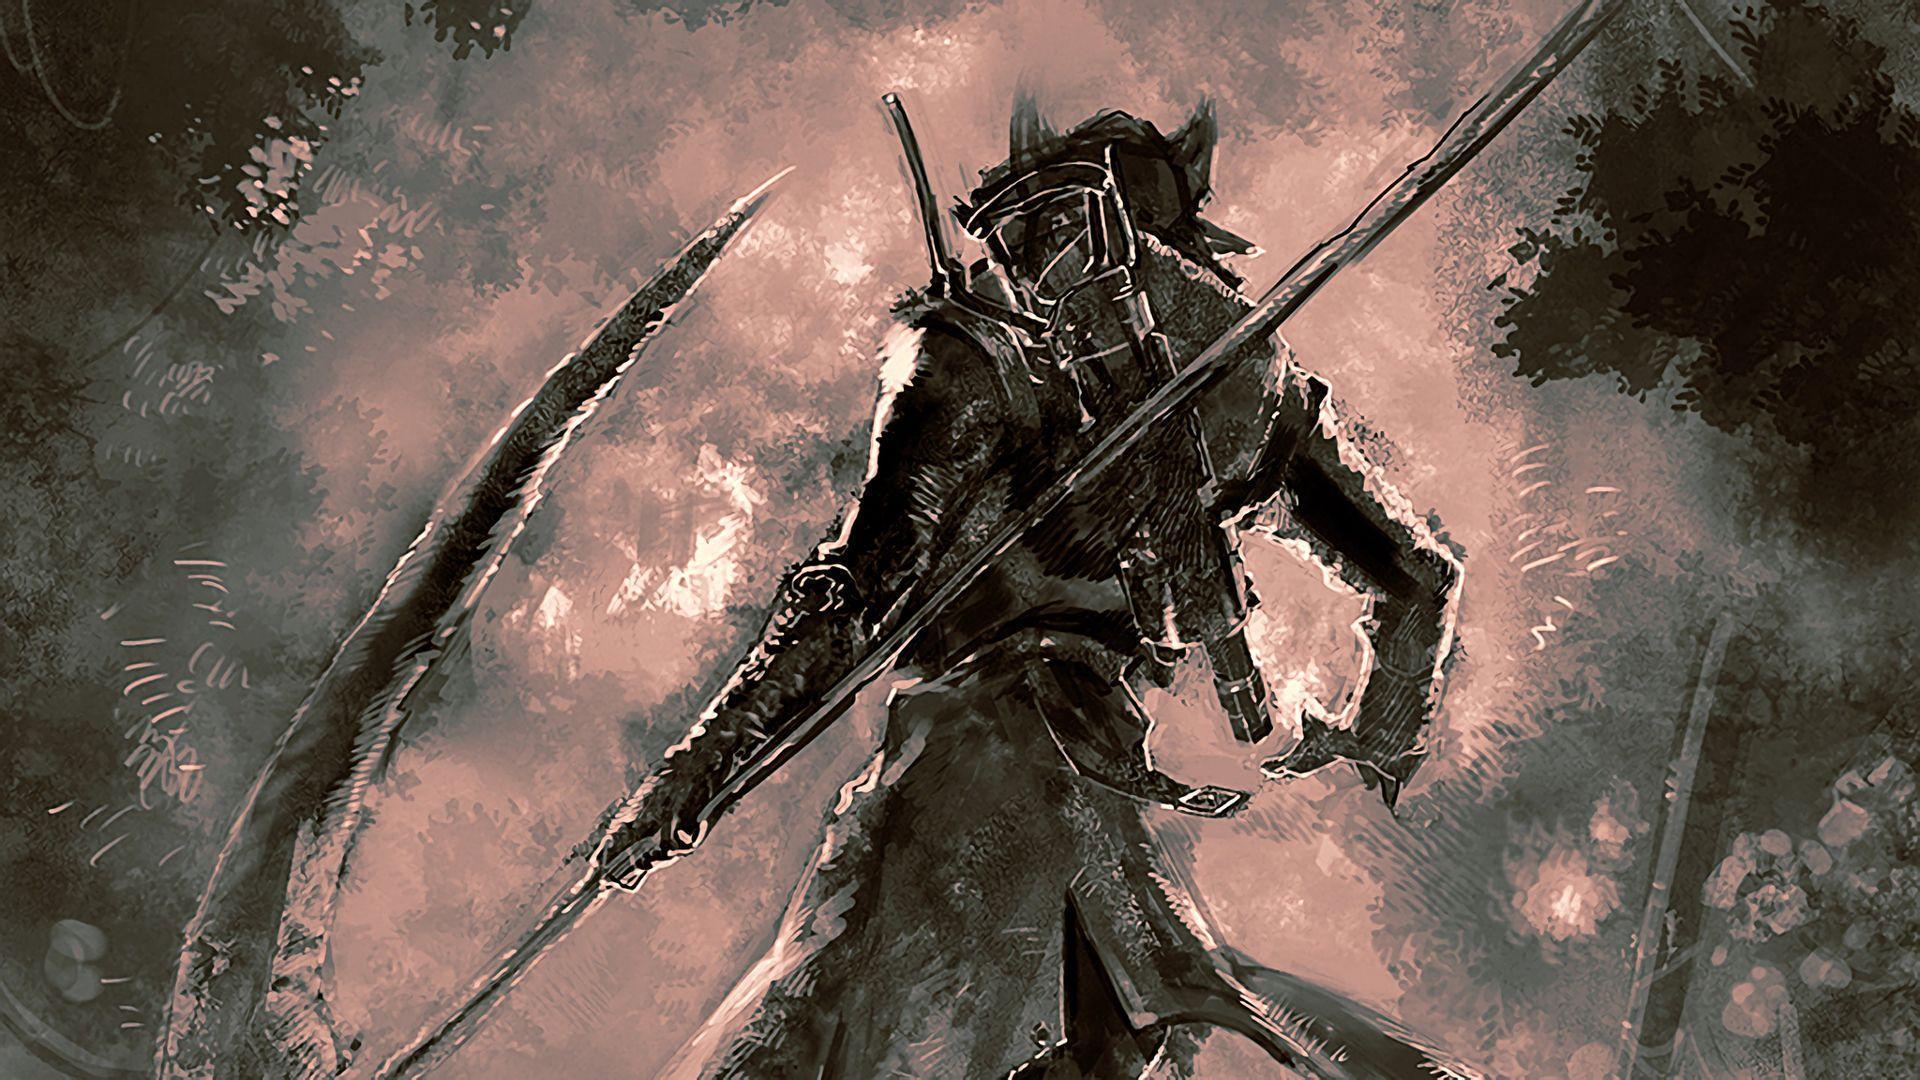 Bloodborne Computer Wallpapers, Desktop Backgrounds | 295.64 KB ...